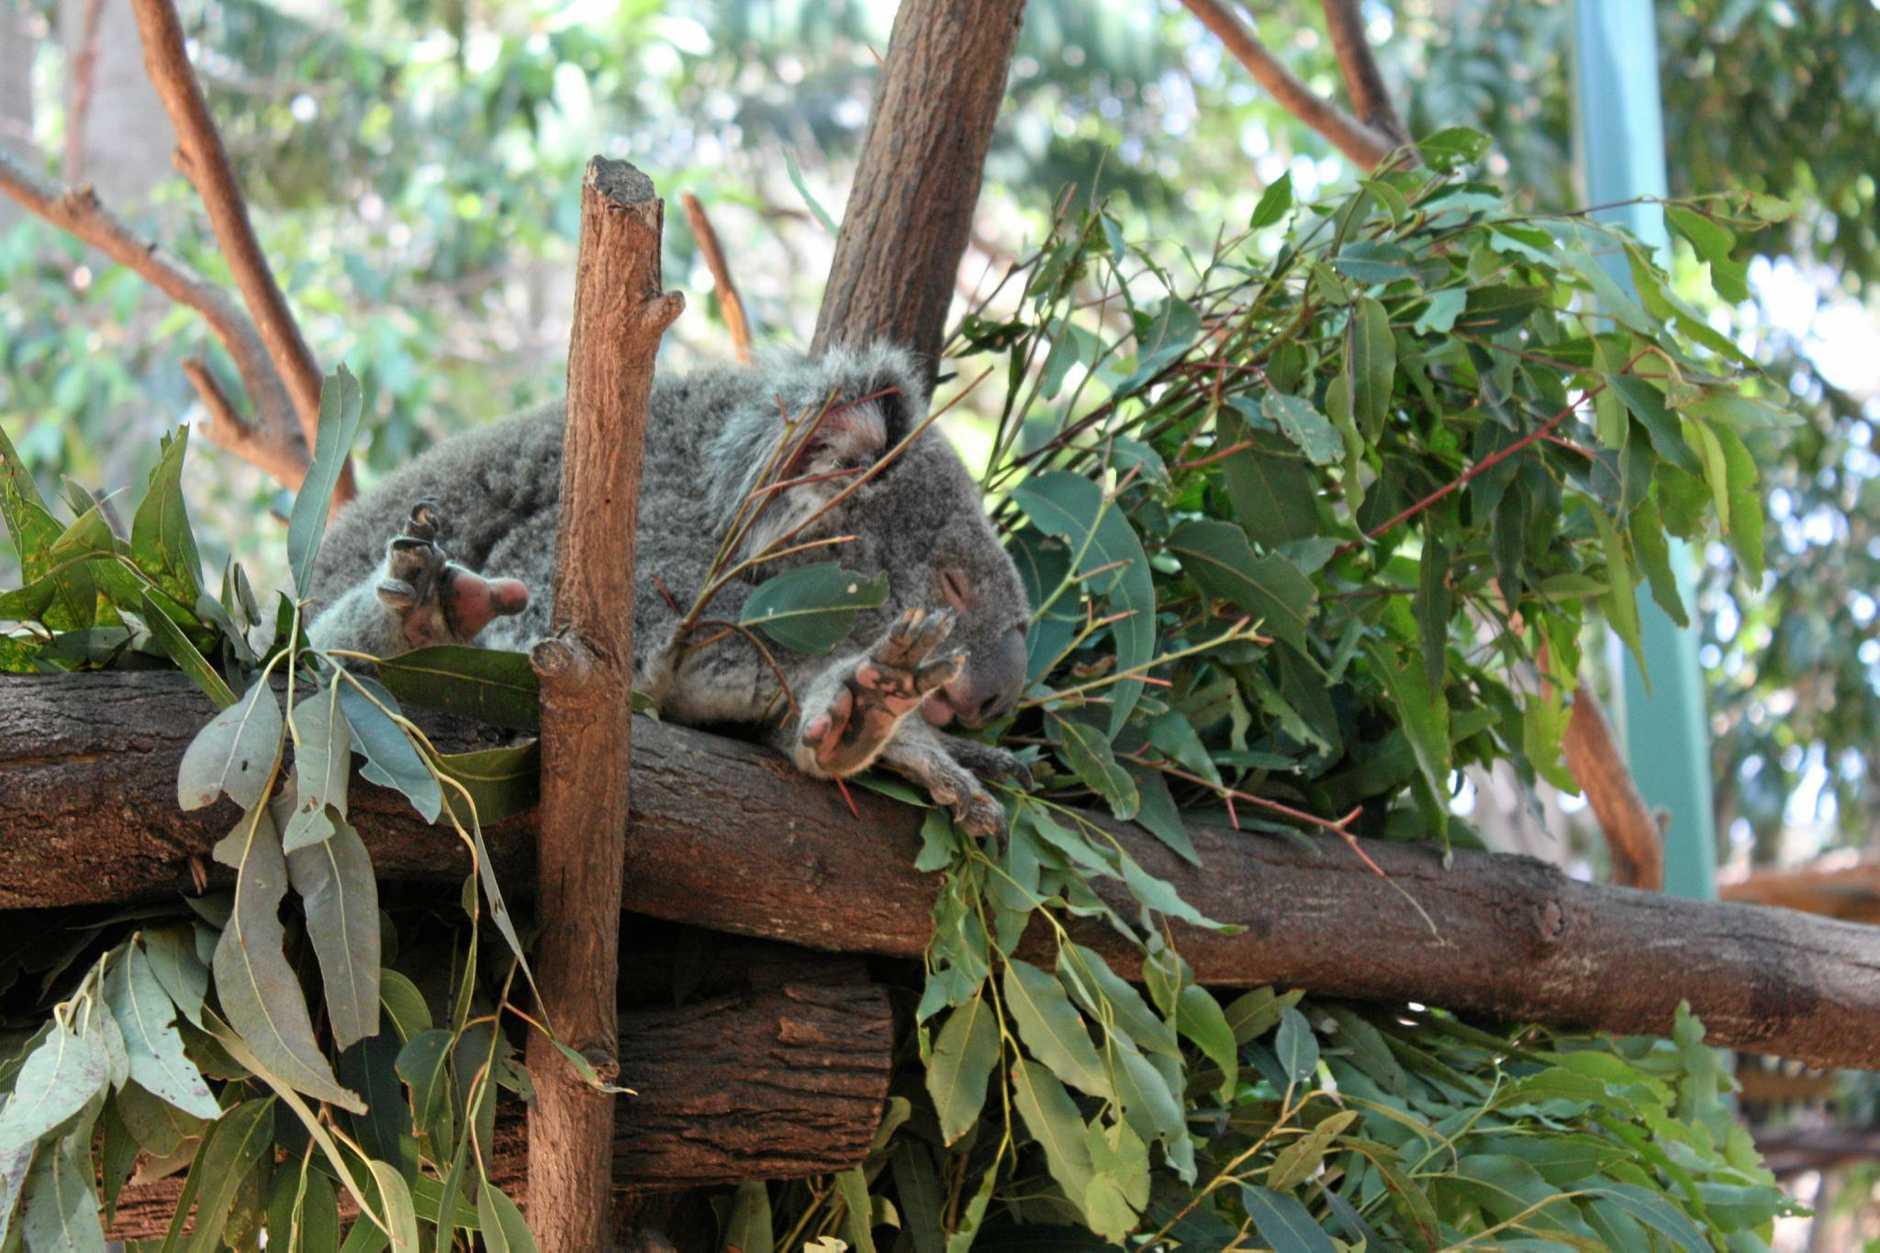 A koala takes a nap at Currumbin Wildlife Sanctuary.